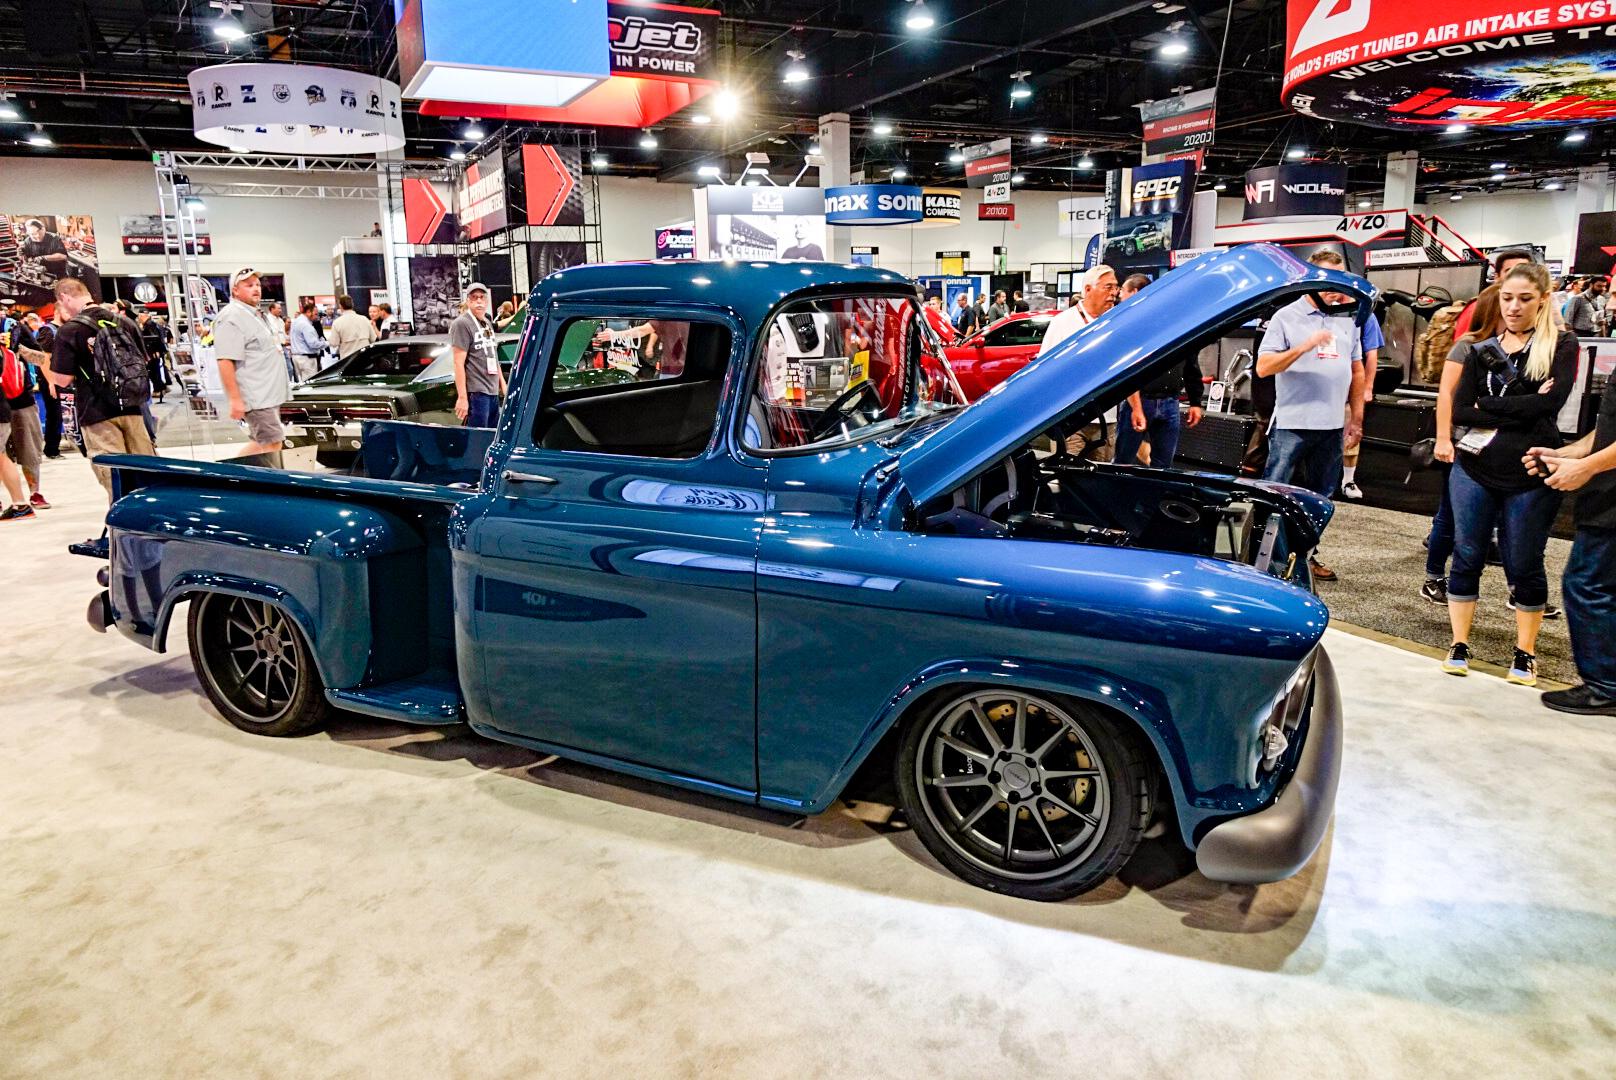 custom 1957 Chevy pickup profile